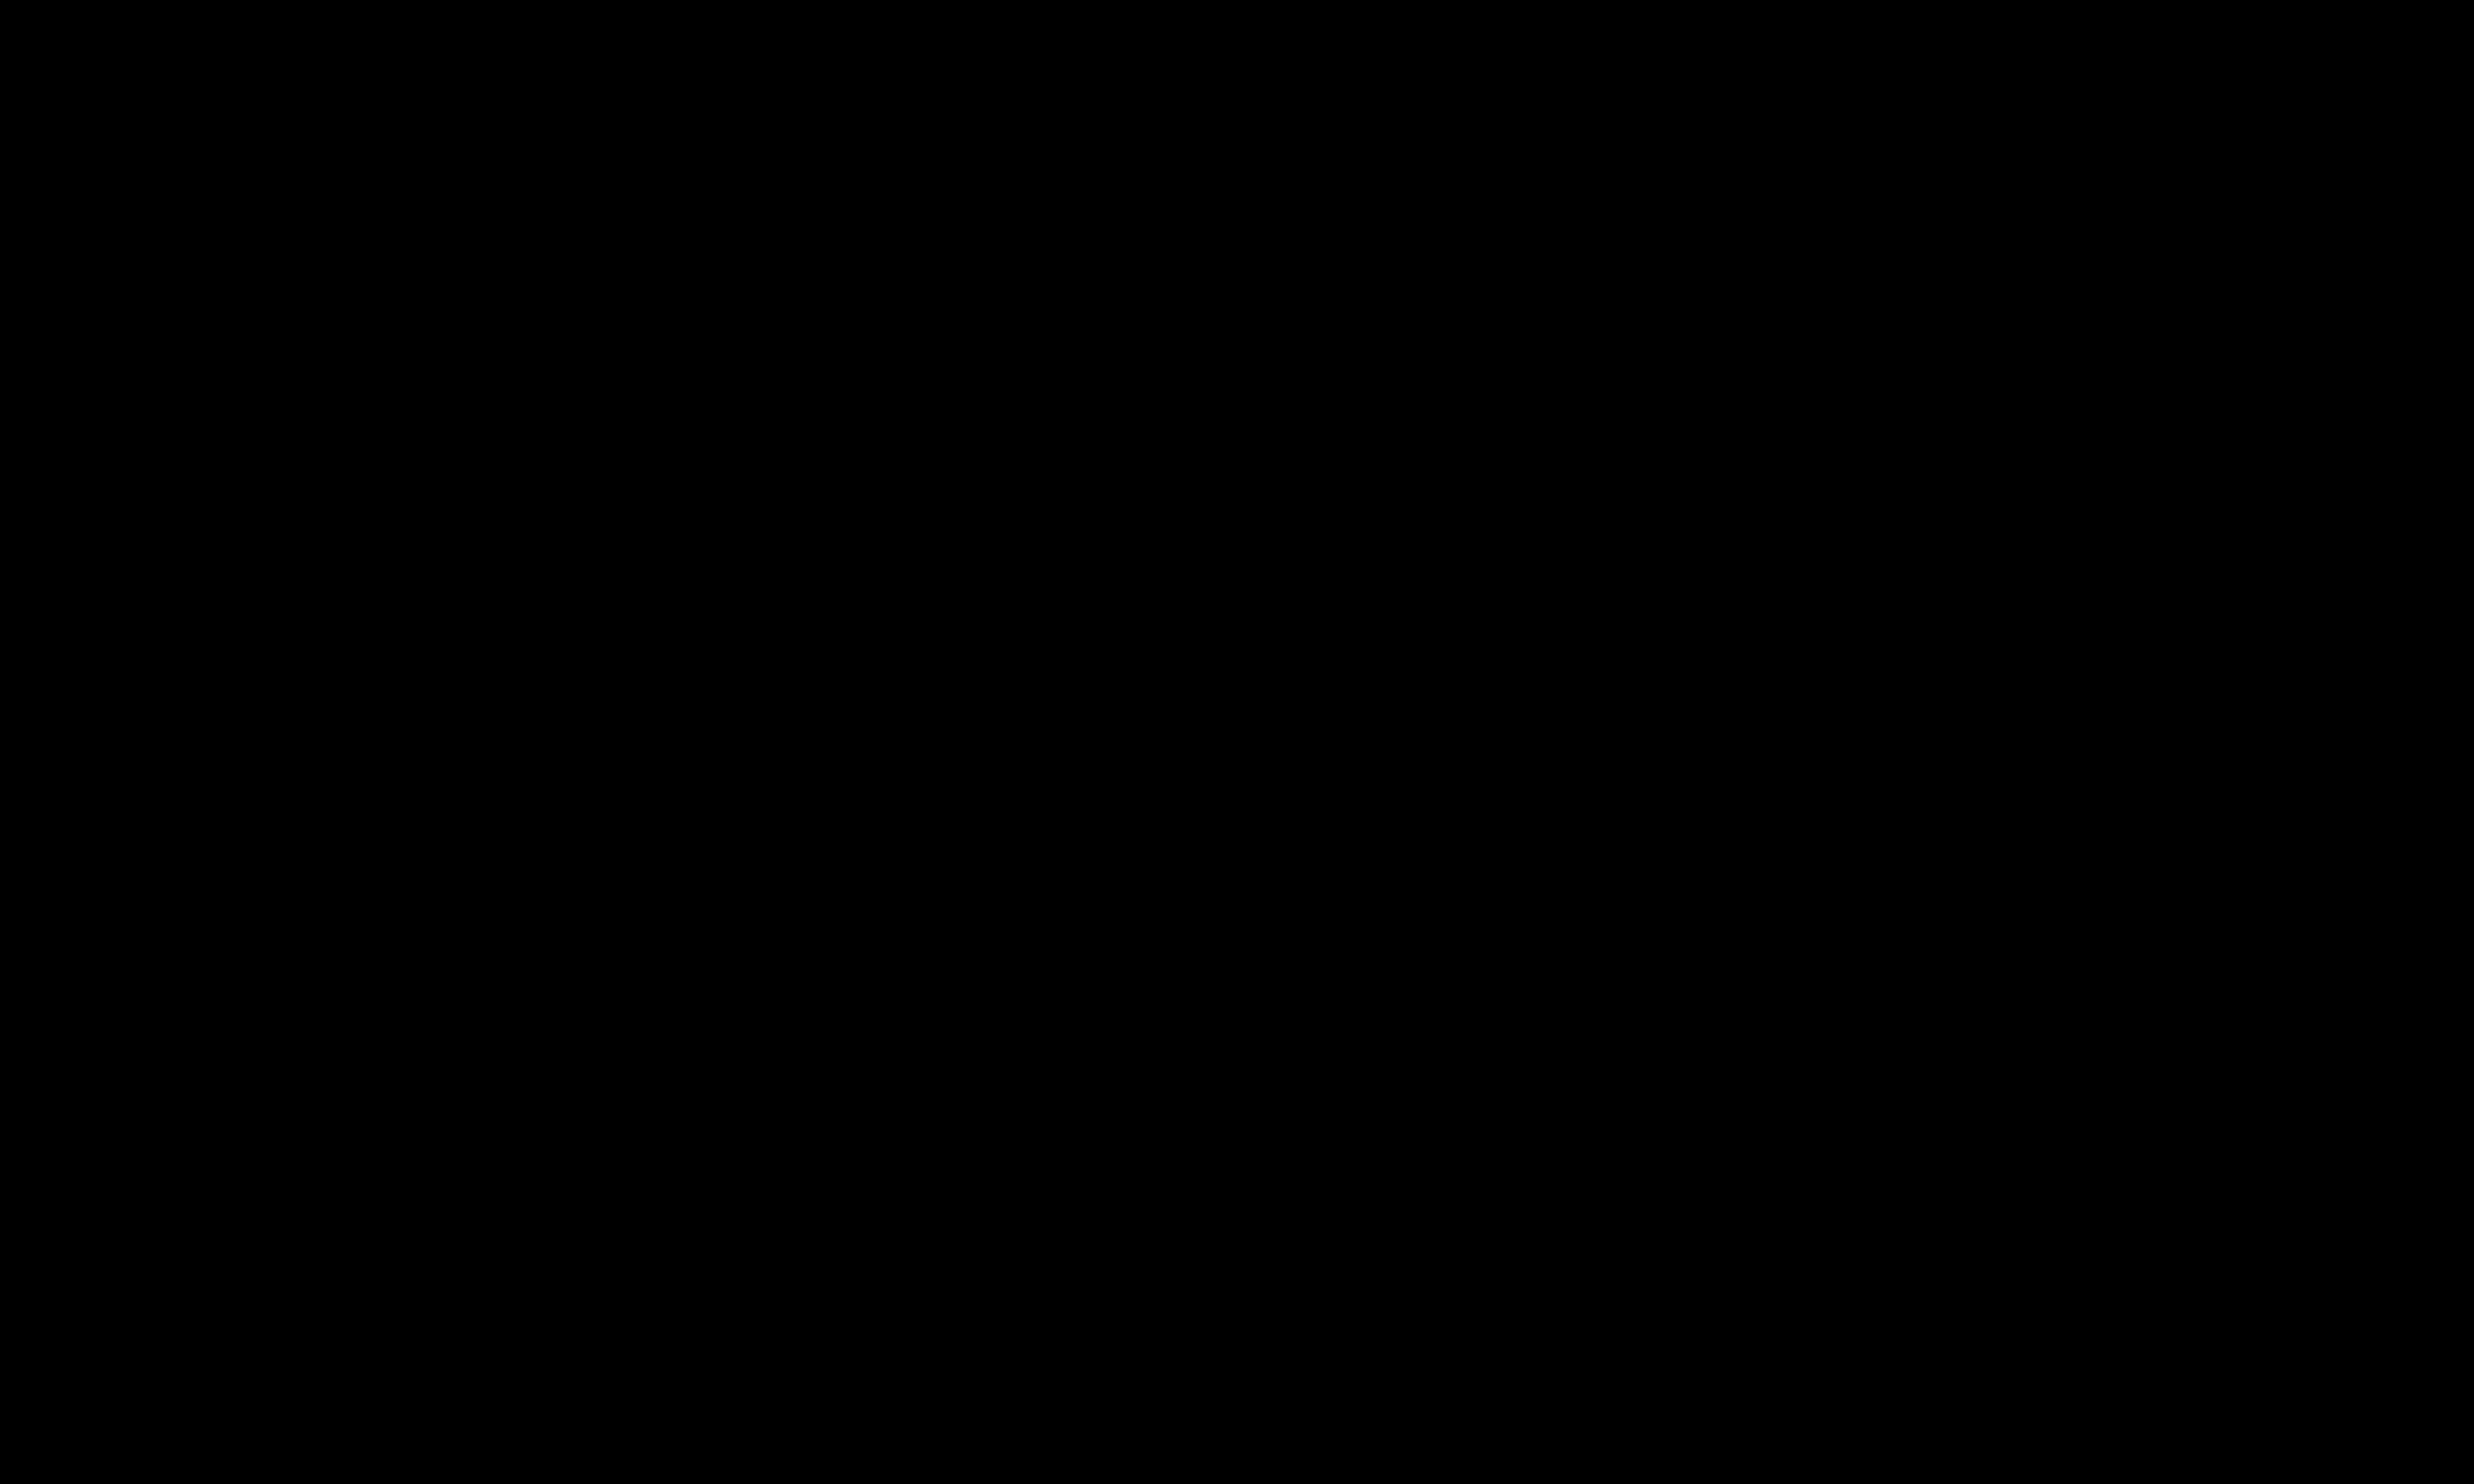 bespoke-01.png